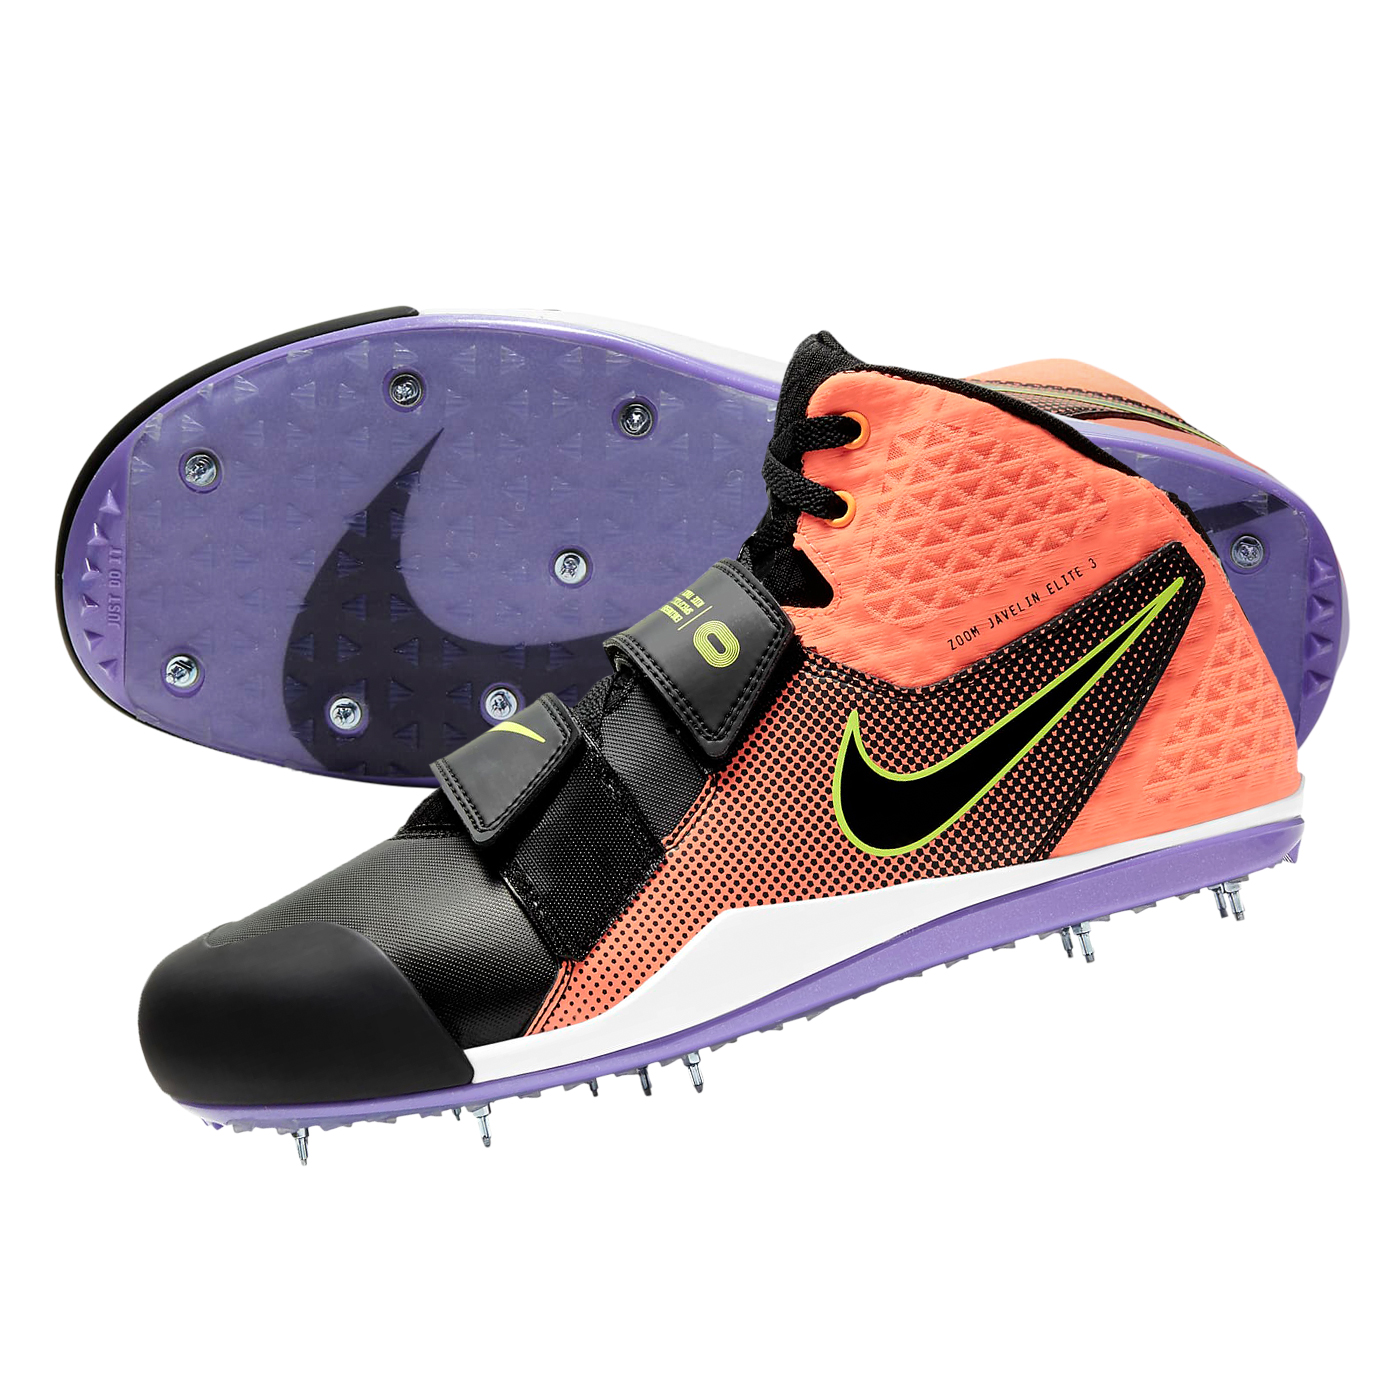 NIKE 田徑標槍釘鞋  @ZOOM JAVELIN ELITE 3@AJ8119800 - 亮橘黑綠紫